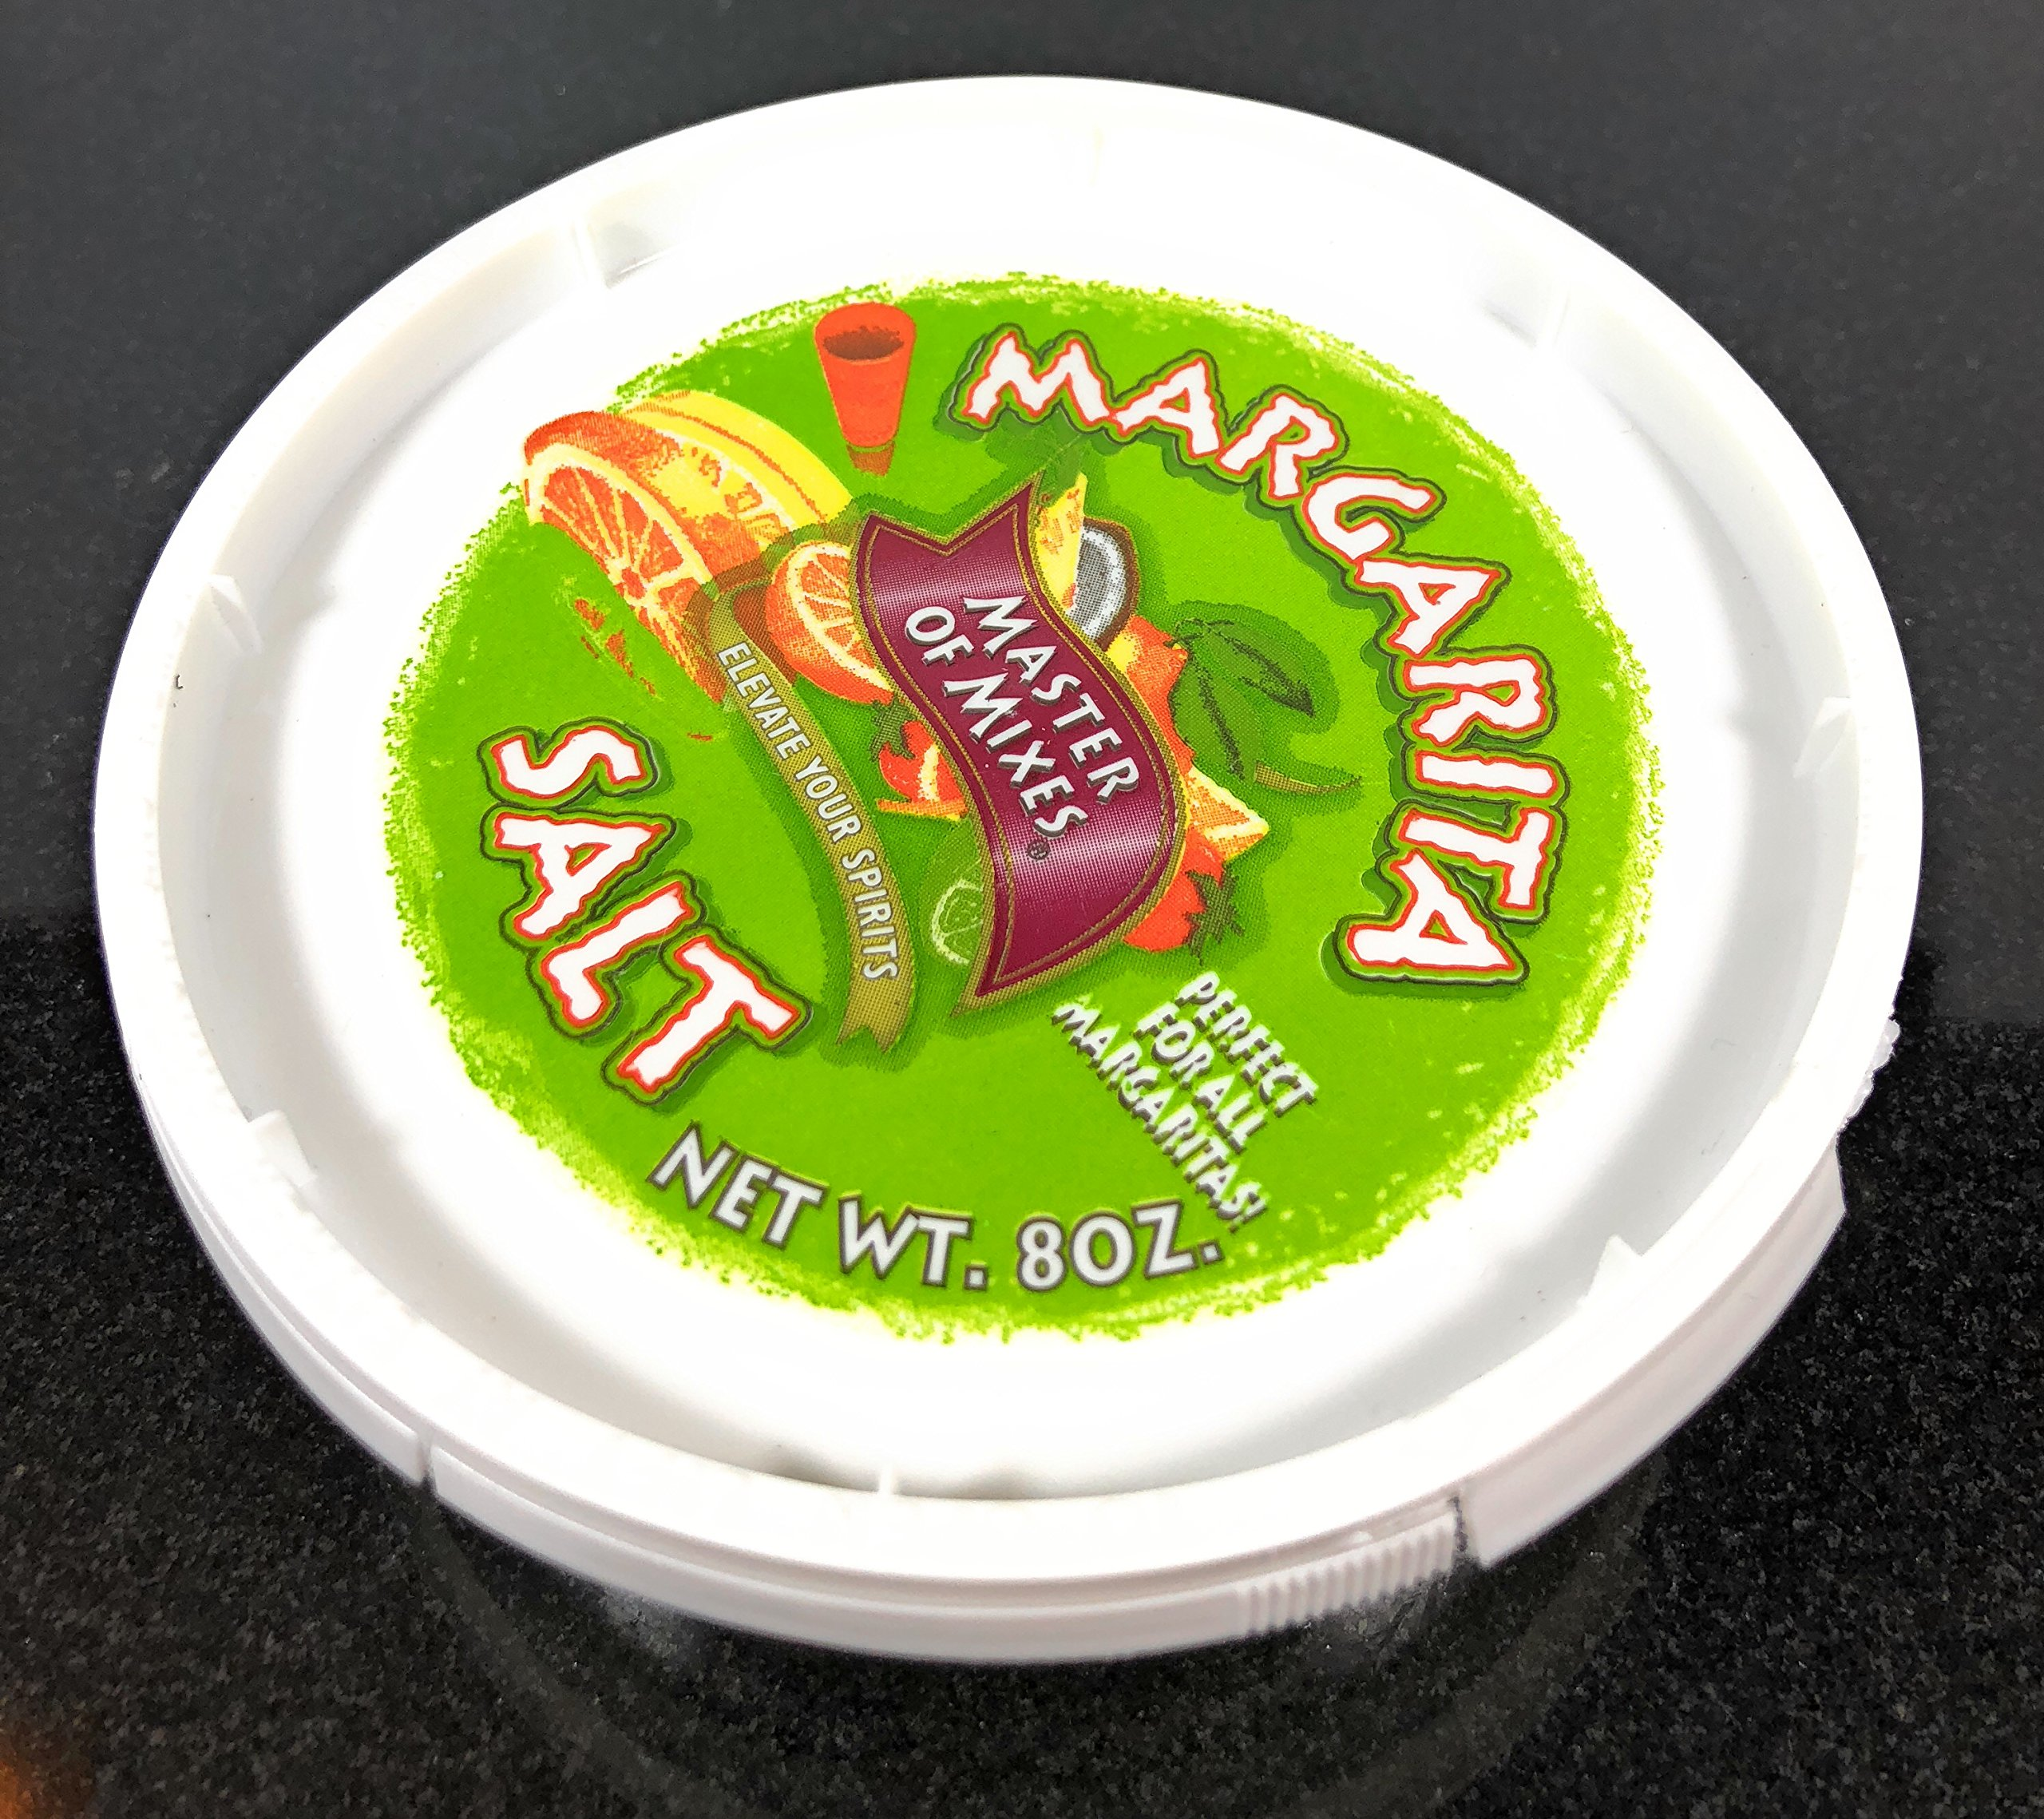 Margarita Salt Glass Rimmer BUNDLE - Bar Quality Rimmer, 8oz Margarita Salt Container, 3 Replacement Sponges | Perfect for Margaritas & Cocktails | 3-Tier Rotating Trays Salt Sugar Lime Juice SUMMIT by SUMMIT Salt Rimmer Bundle (Image #4)